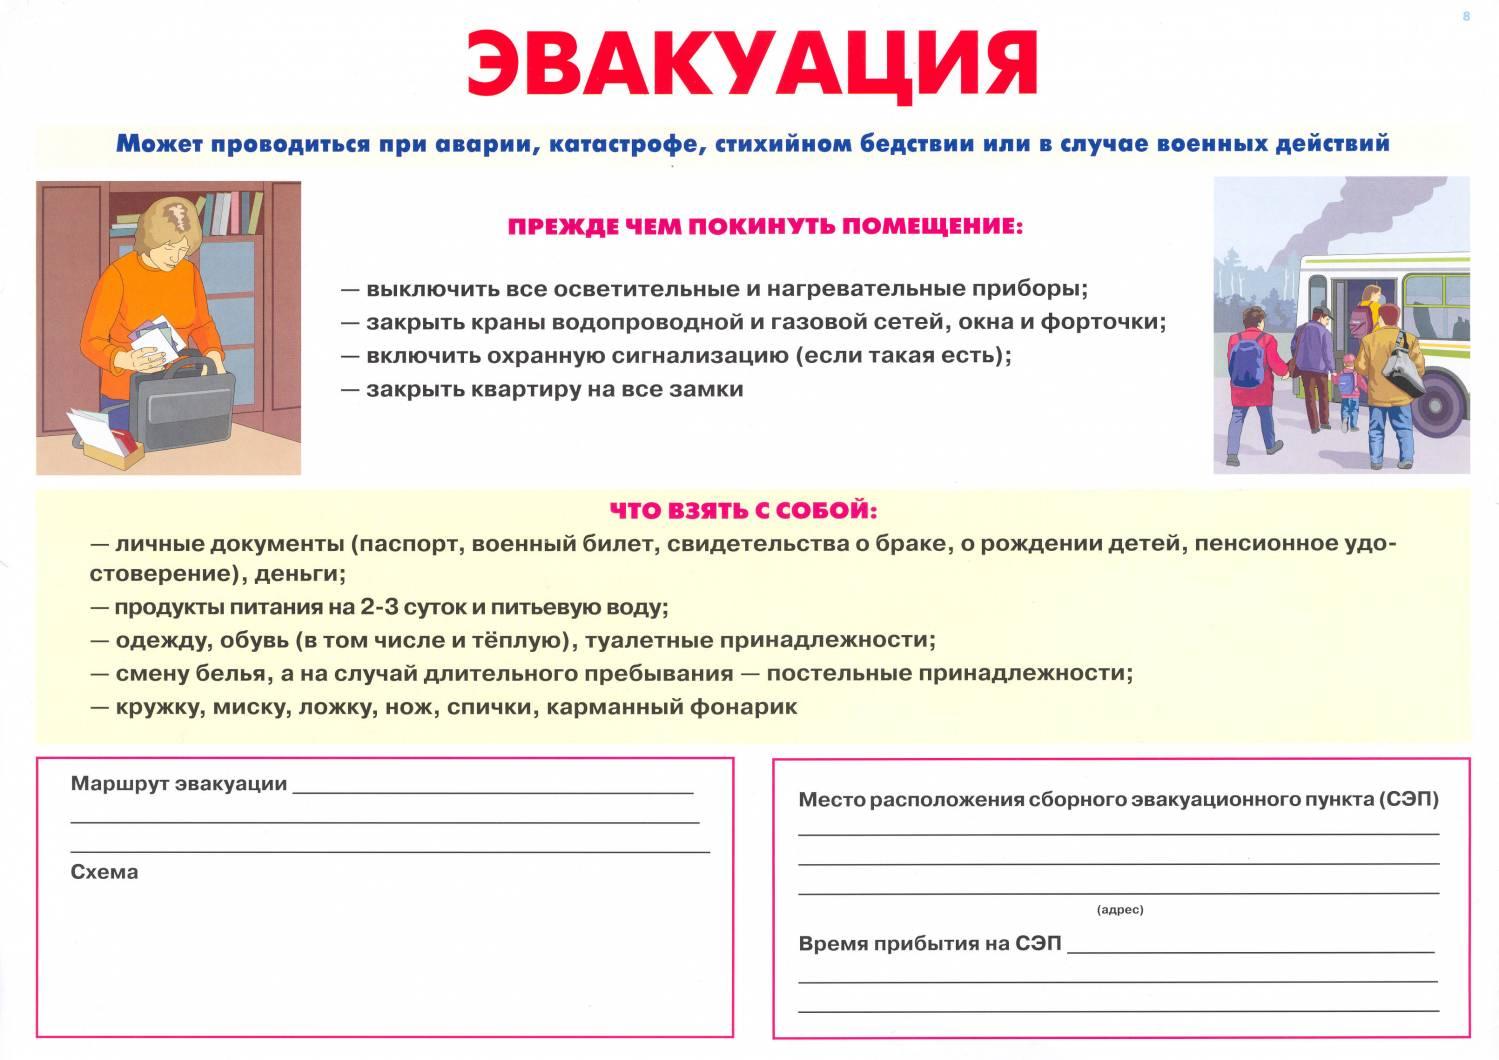 http://novospasskoe.do.am/_nw/2/29293096.jpg